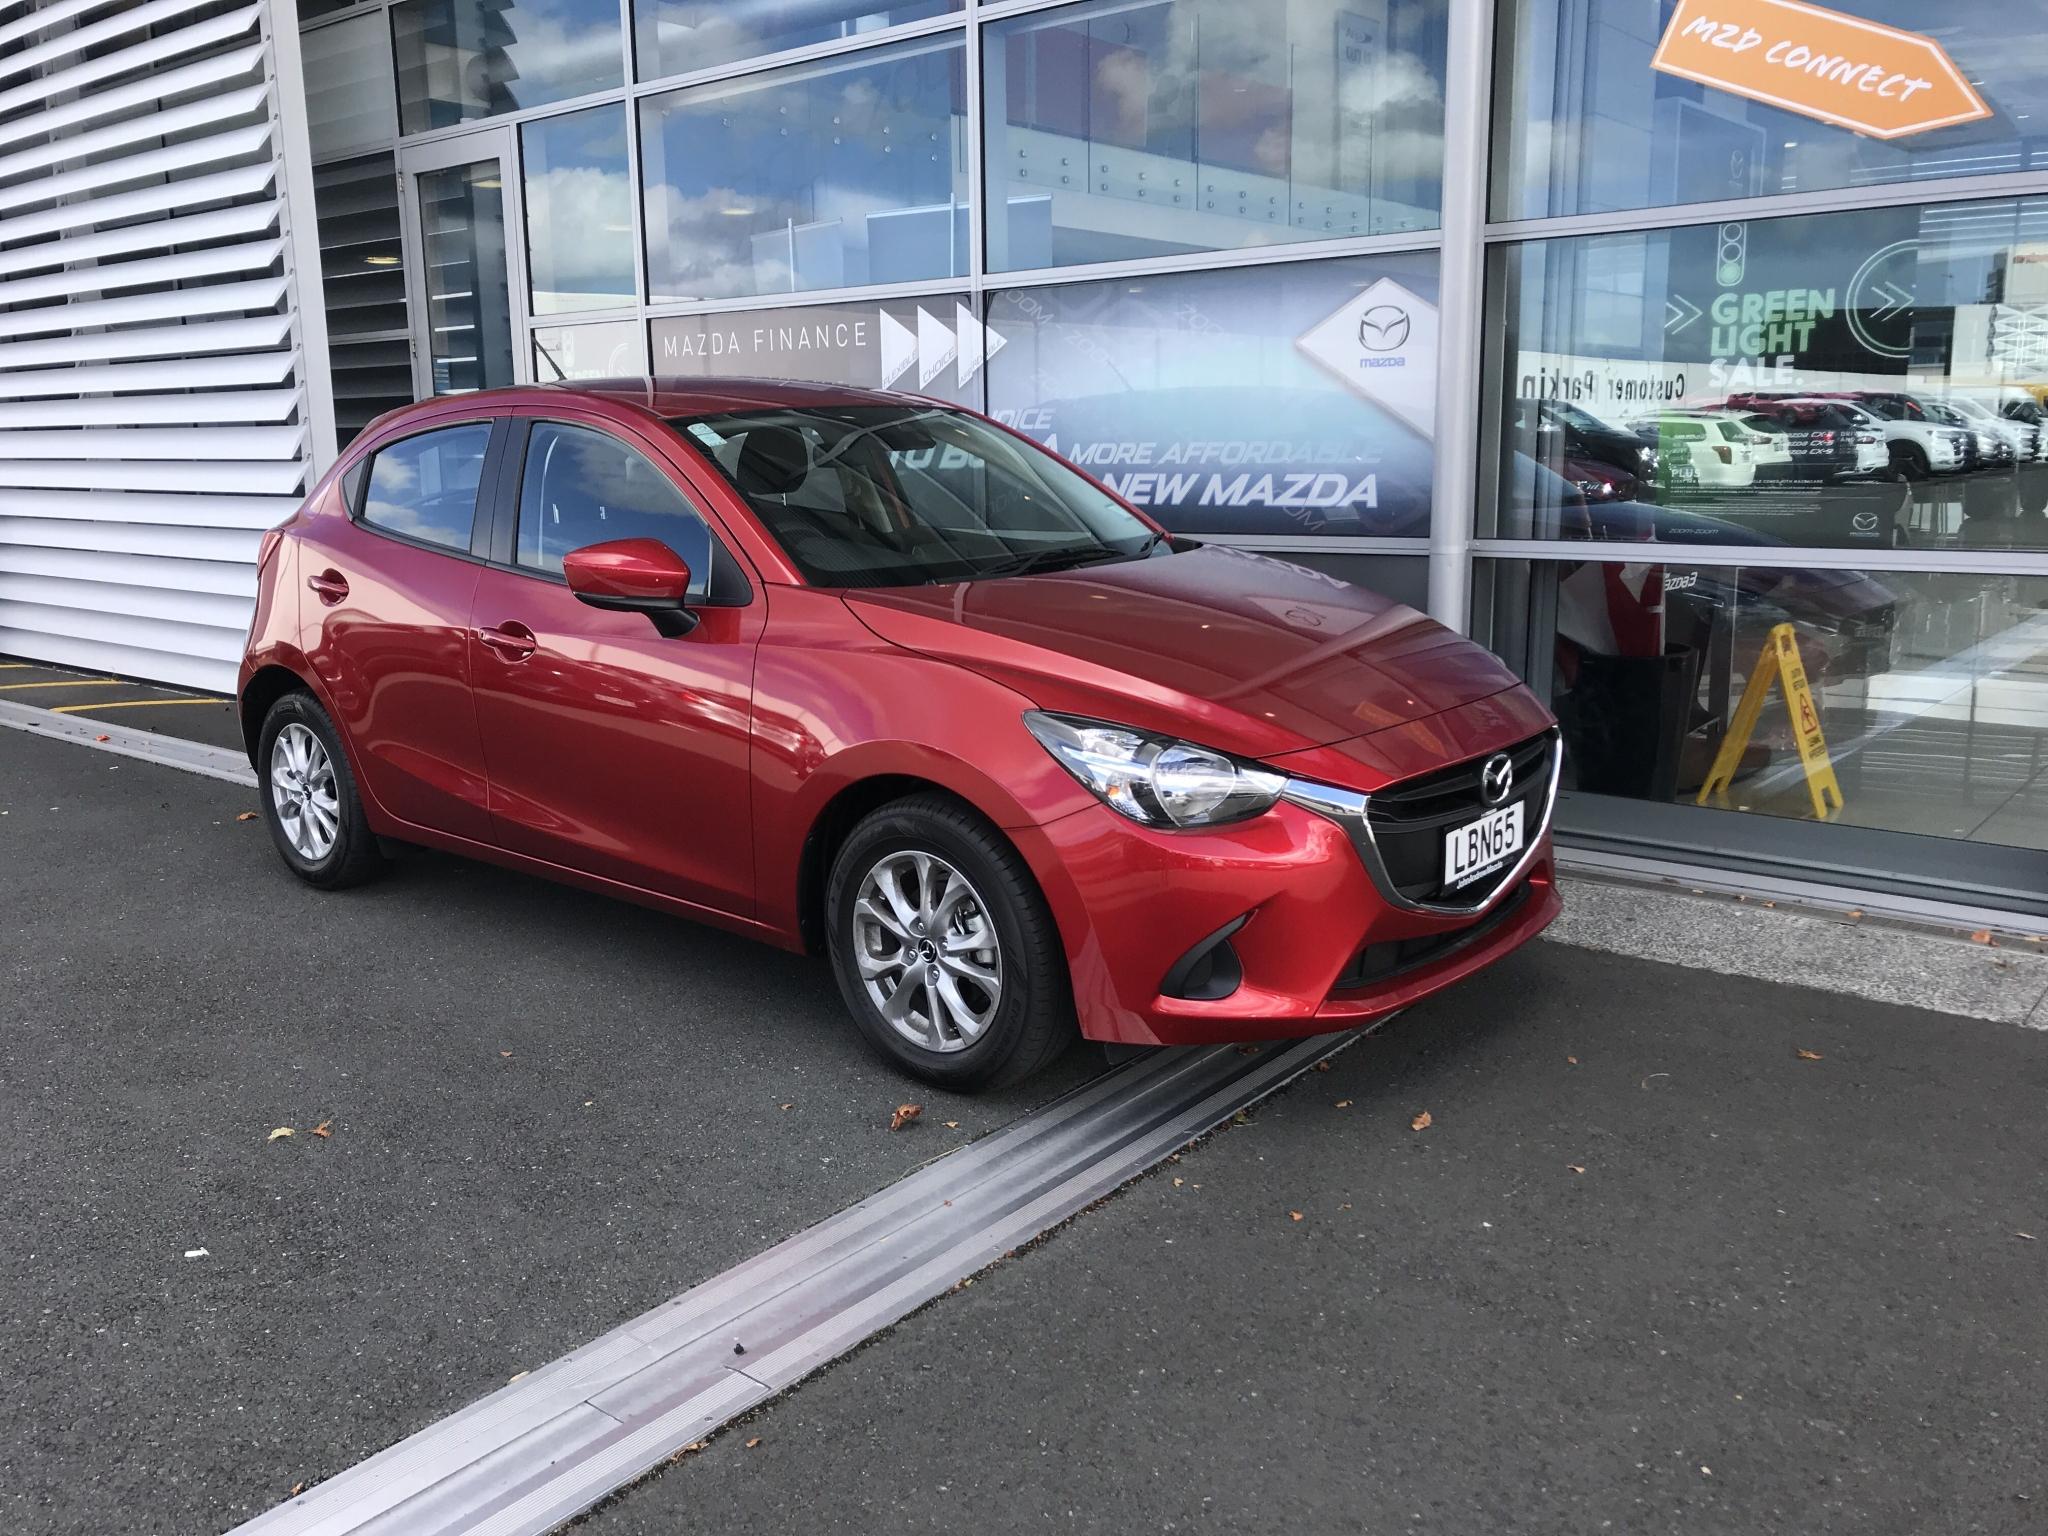 Mazda 2 GLX 1.5L Hatch Auto 2017 - John Andrew   New, Used and ...